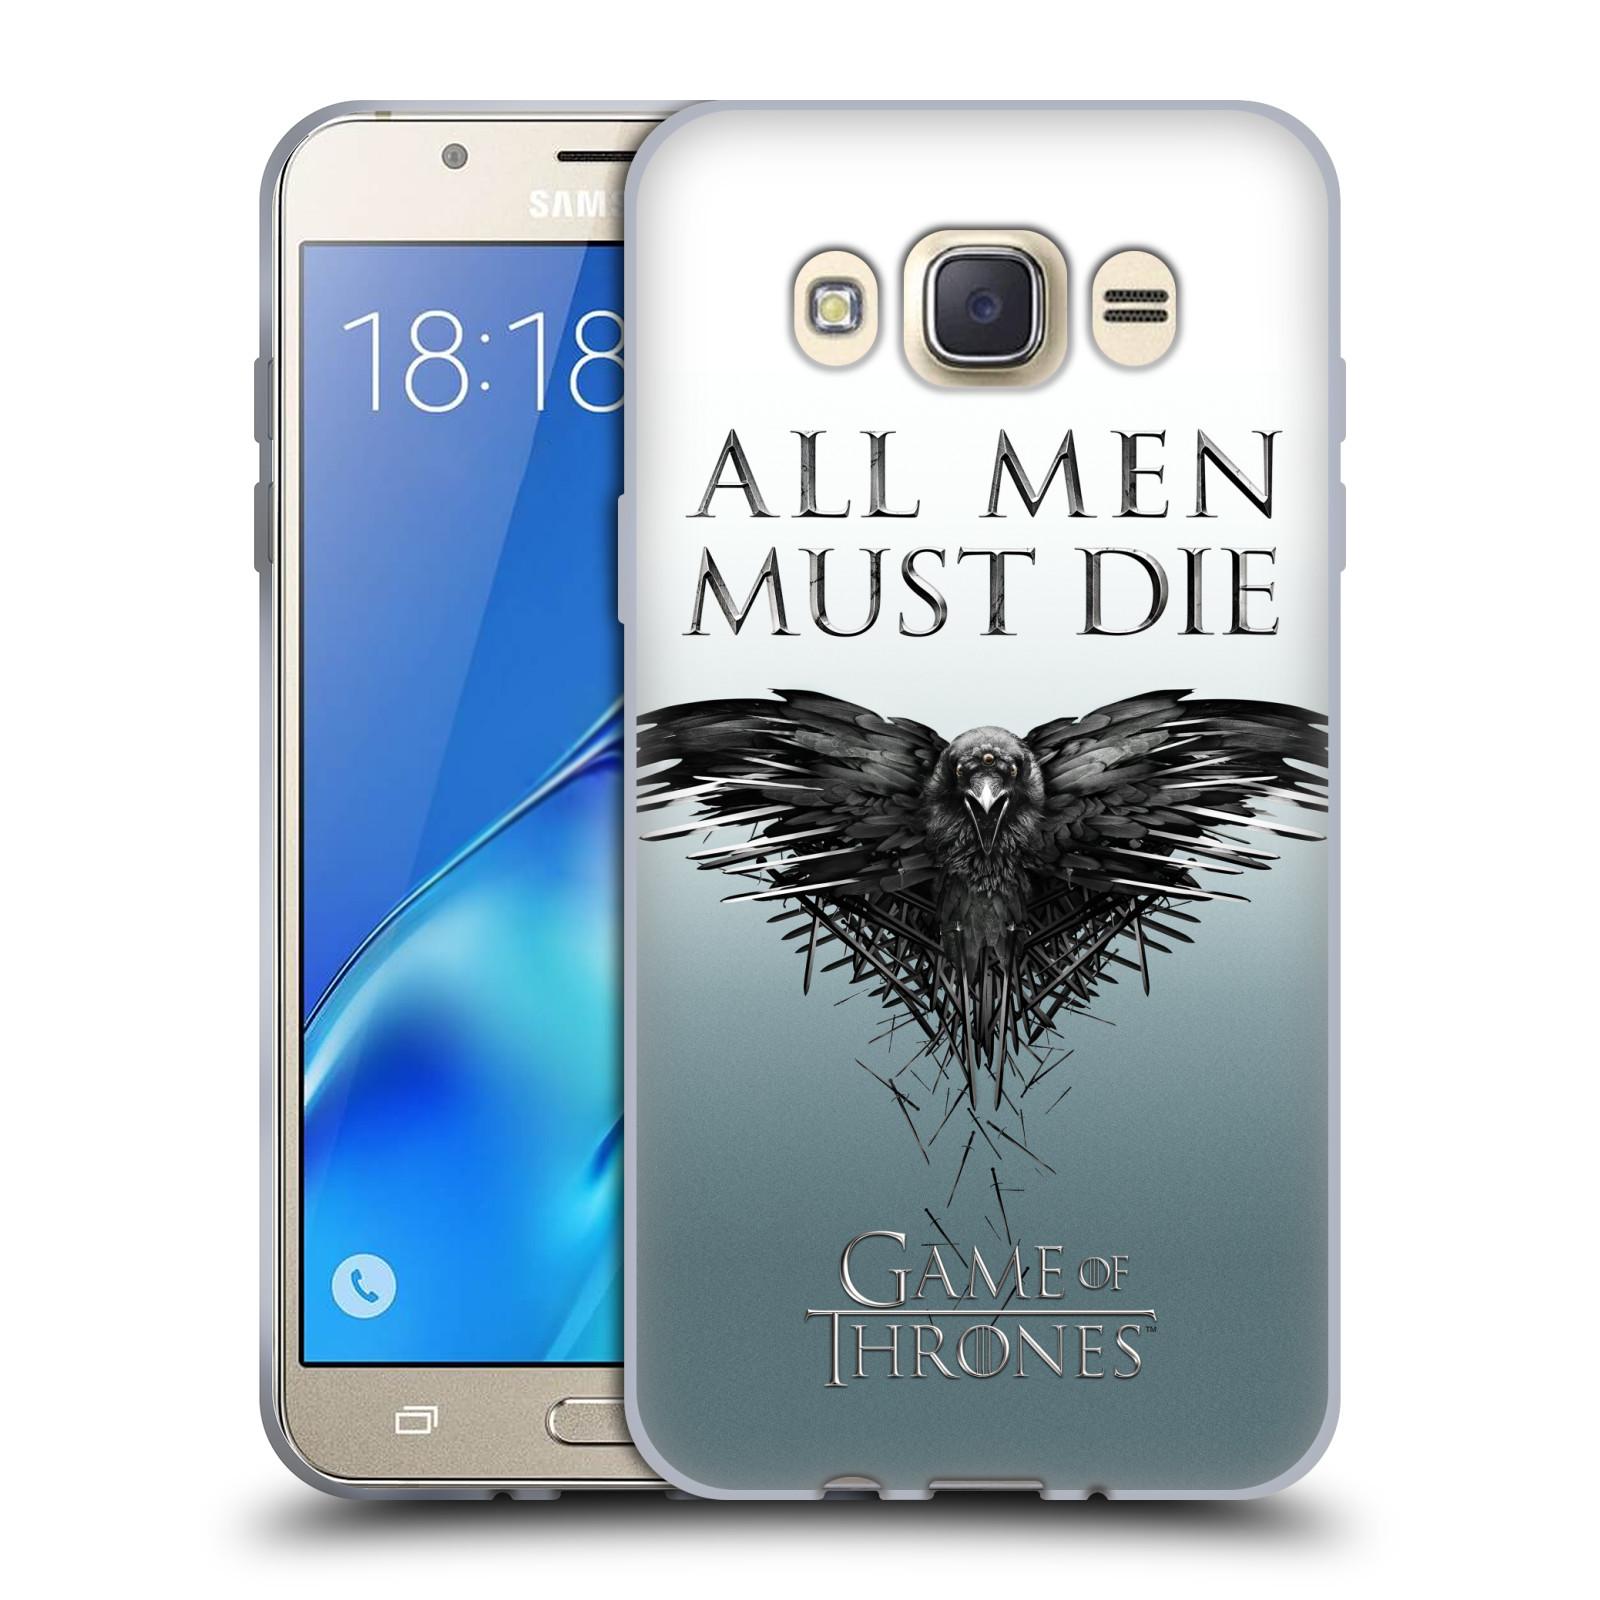 HEAD CASE silikonový obal na mobil Samsung Galaxy J7 2016 oficiální kryt Hra o trůny havran